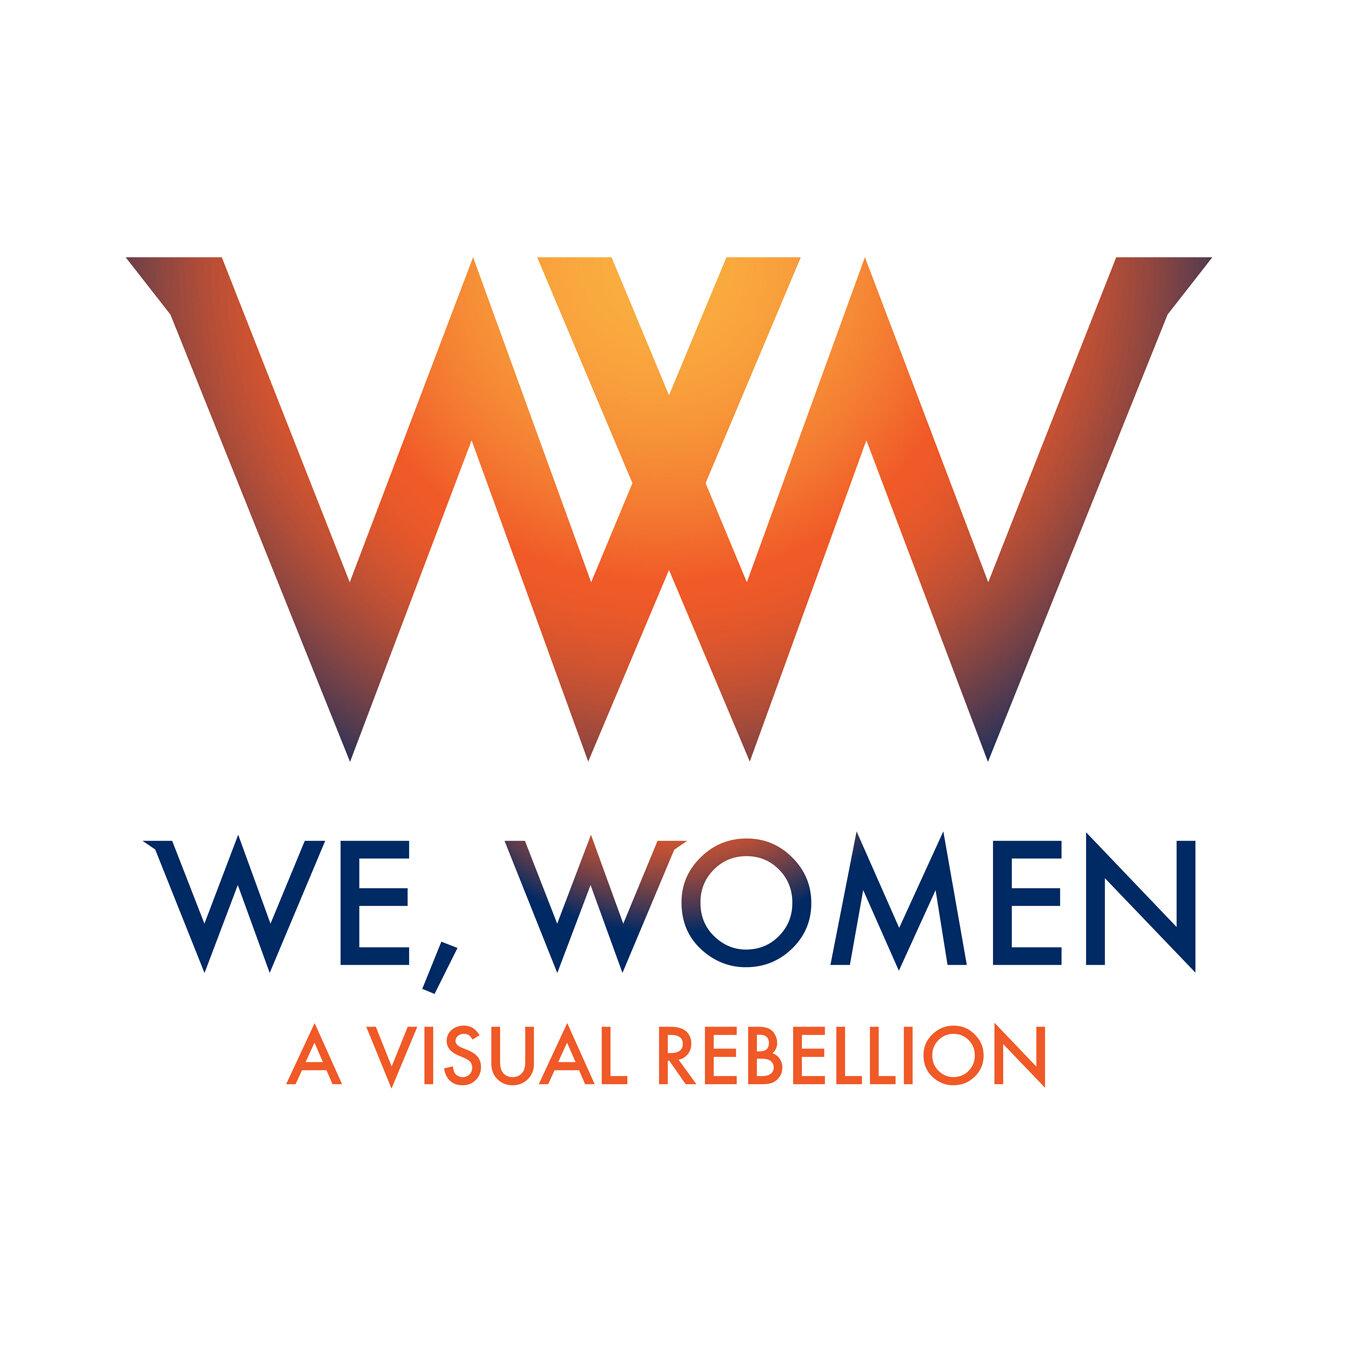 WE, WOMEN LOGO_RESIZE_SQUARE.jpg